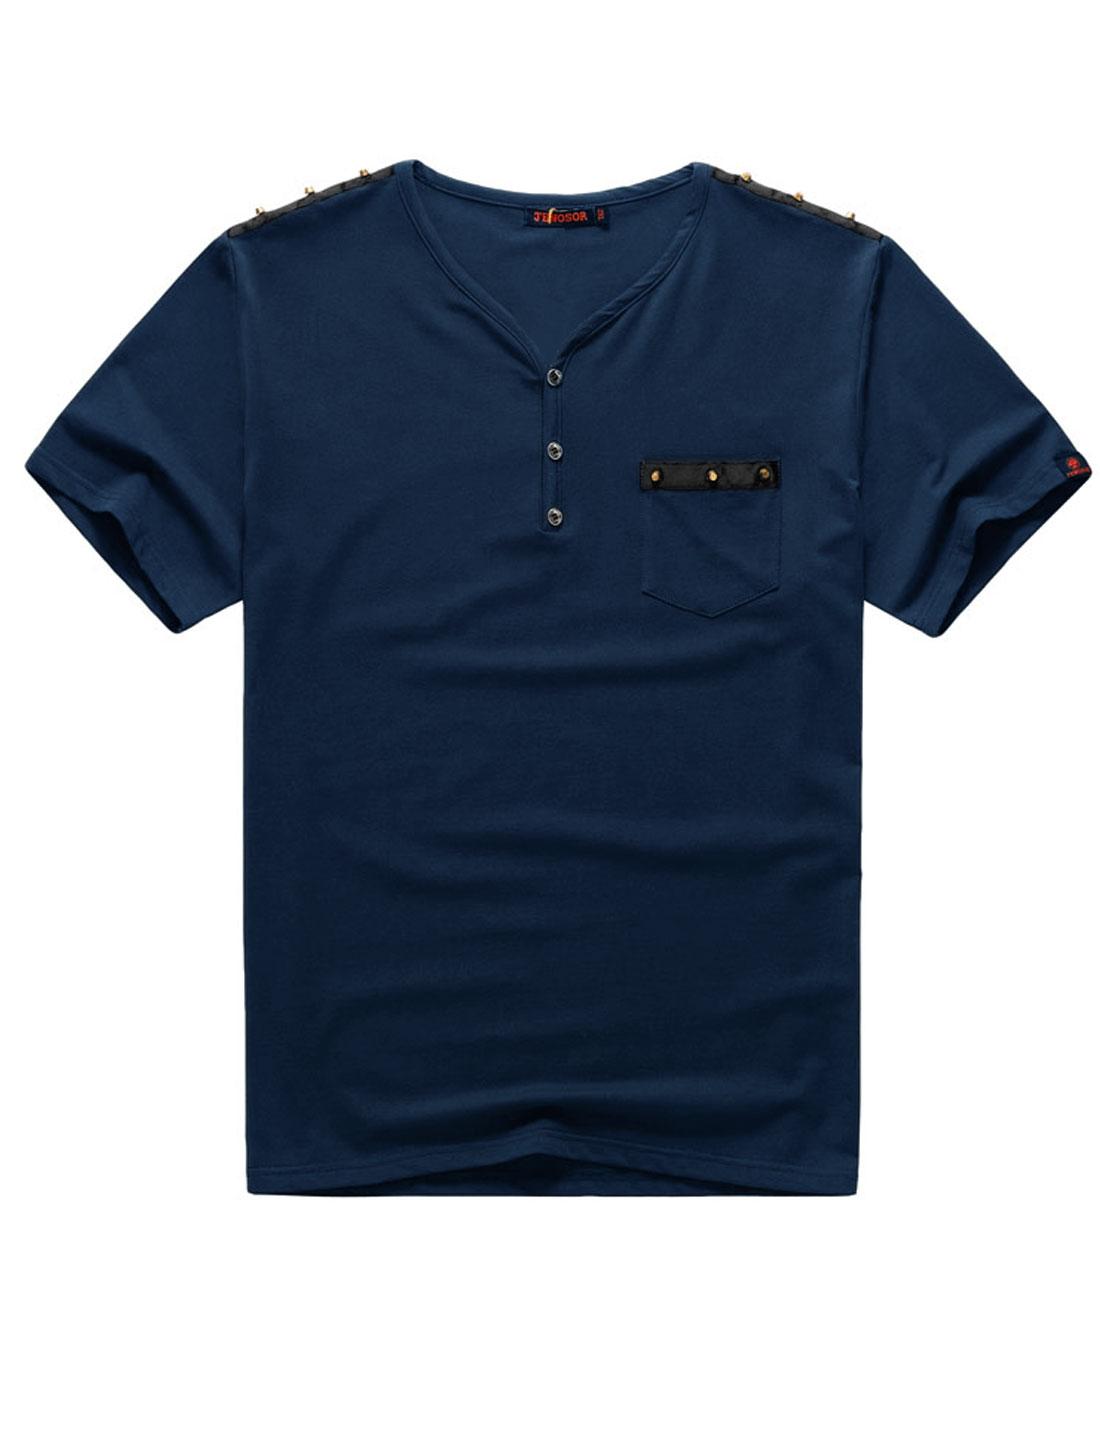 Men Big-Tall Y Neck Studded Decor One Chest Pocket Fashion T-Shirt Navy Blue 2X Big